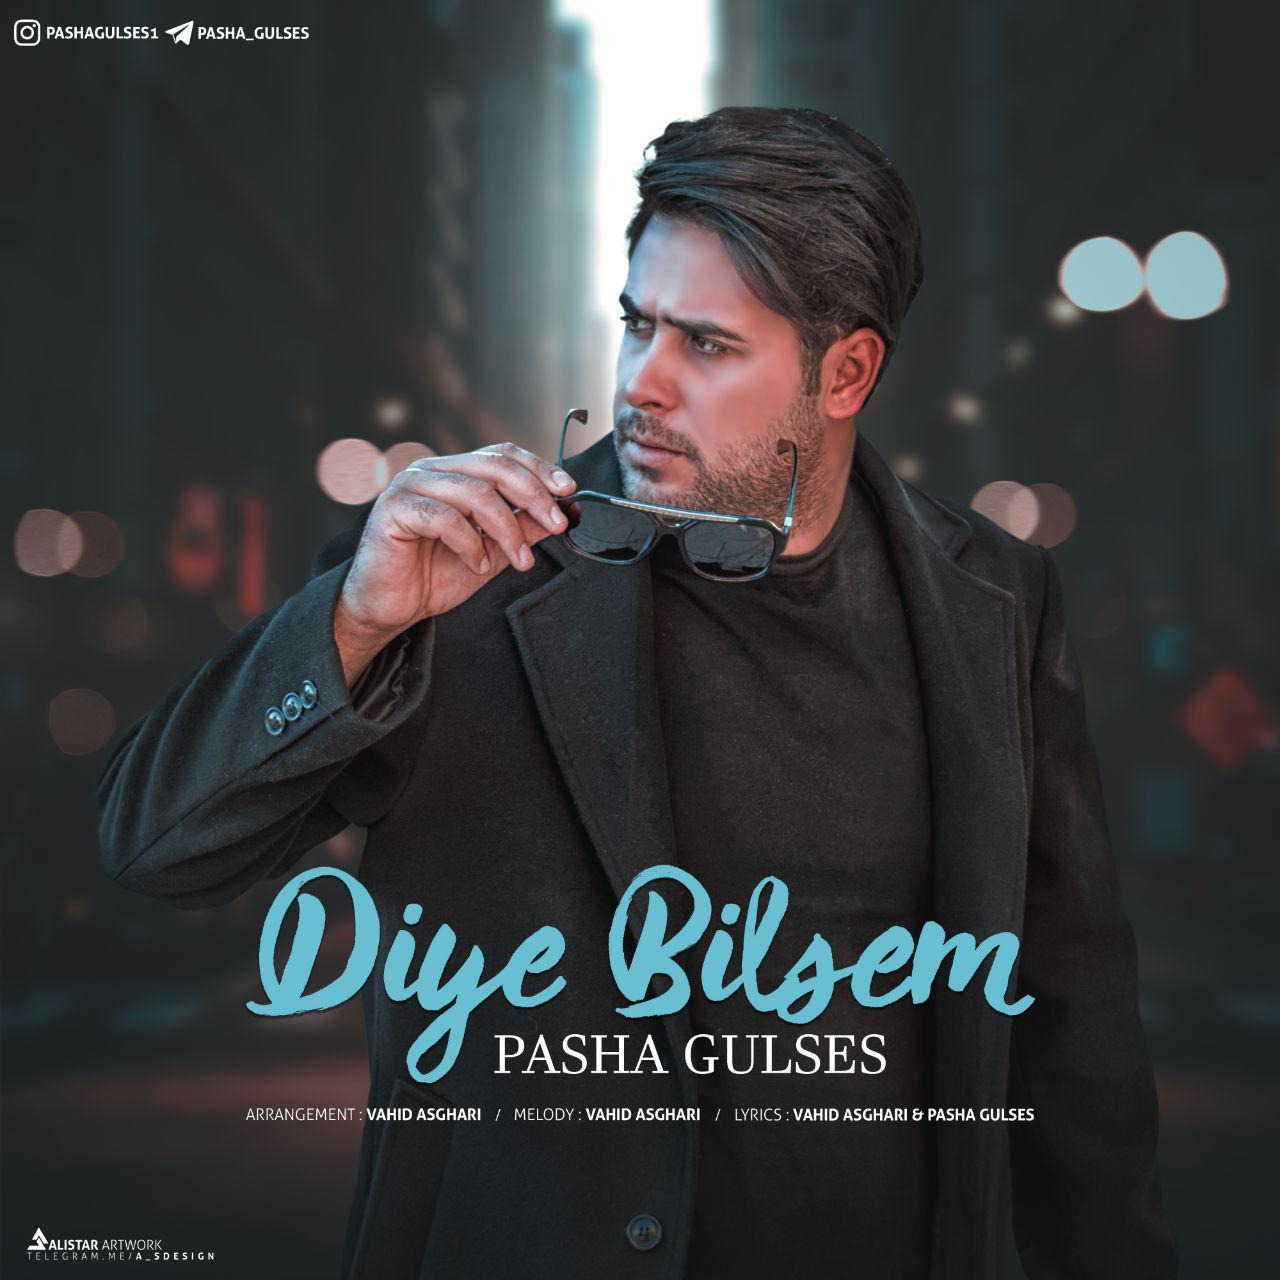 http://birtunes.ir/wp-content/uploads/2018/11/Pasha-Gulses-Diye-Bilsem.jpg